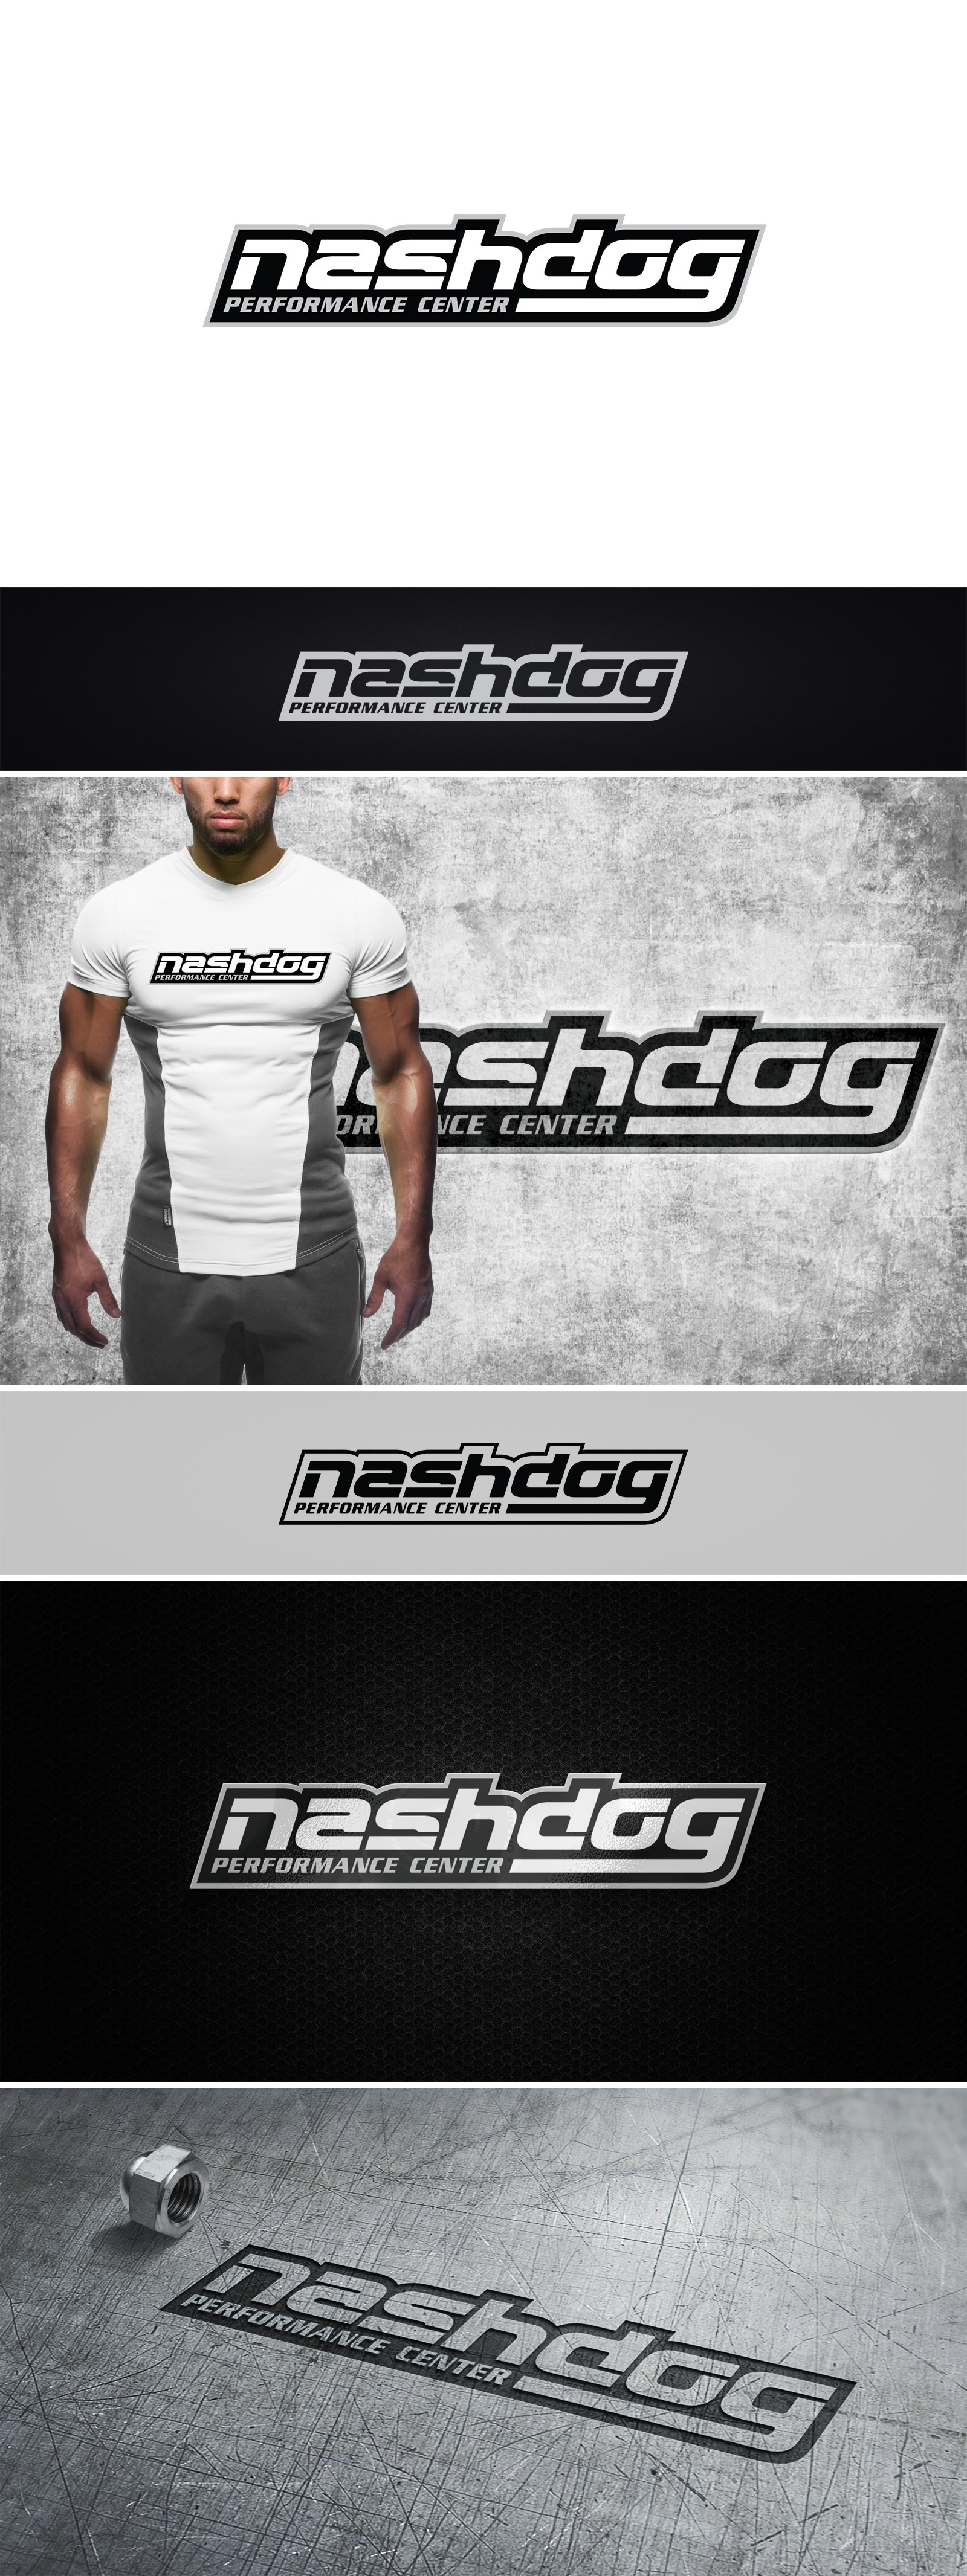 Create a fresh logo for Nashdog Performance Center!